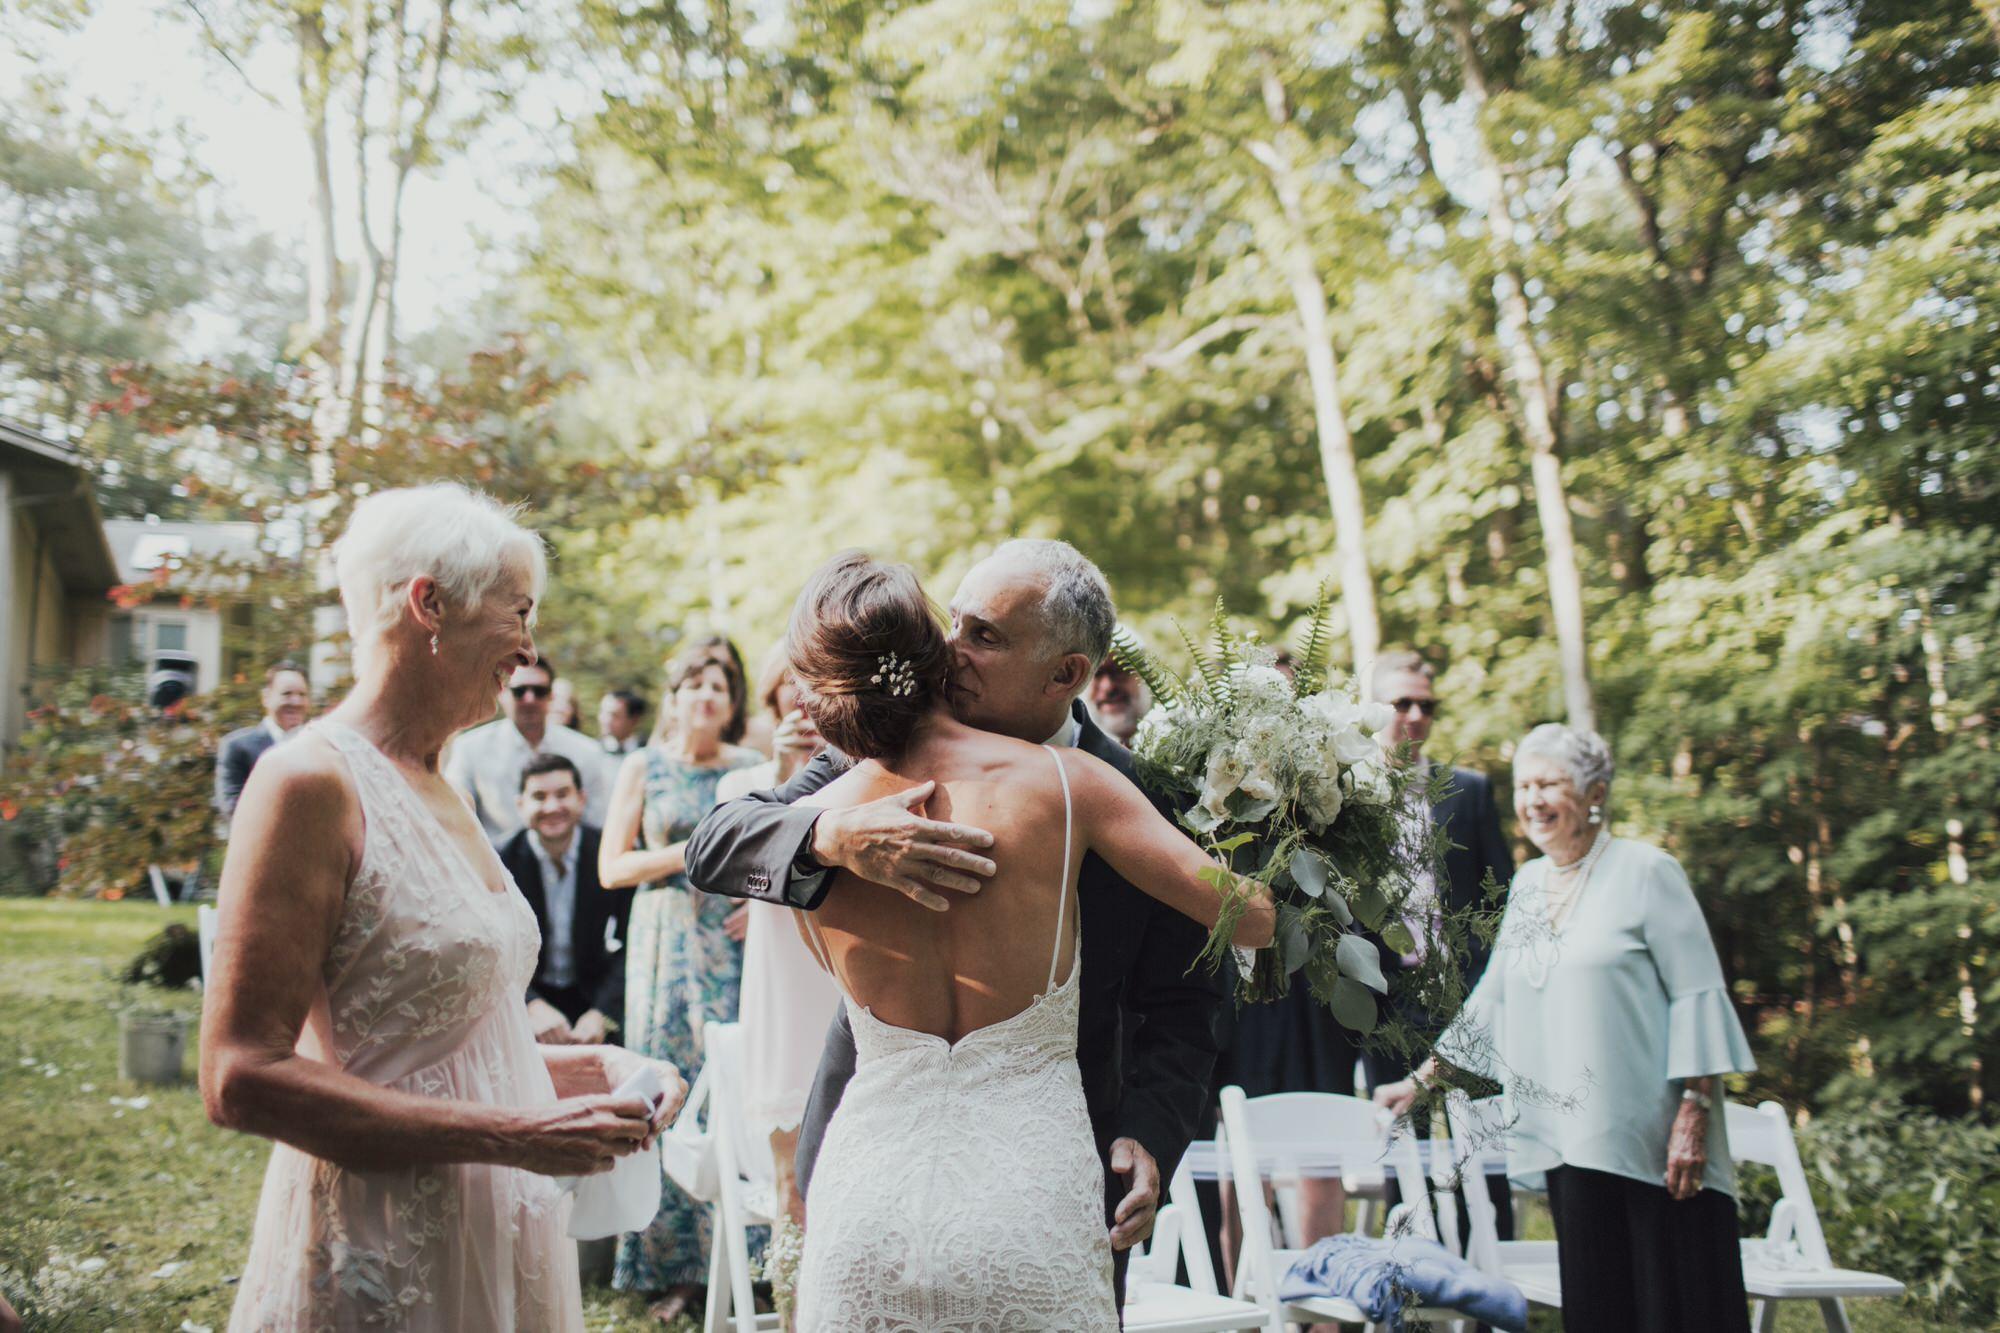 emily-aaron-rochester-new-york-wedding-photographer-62.JPG